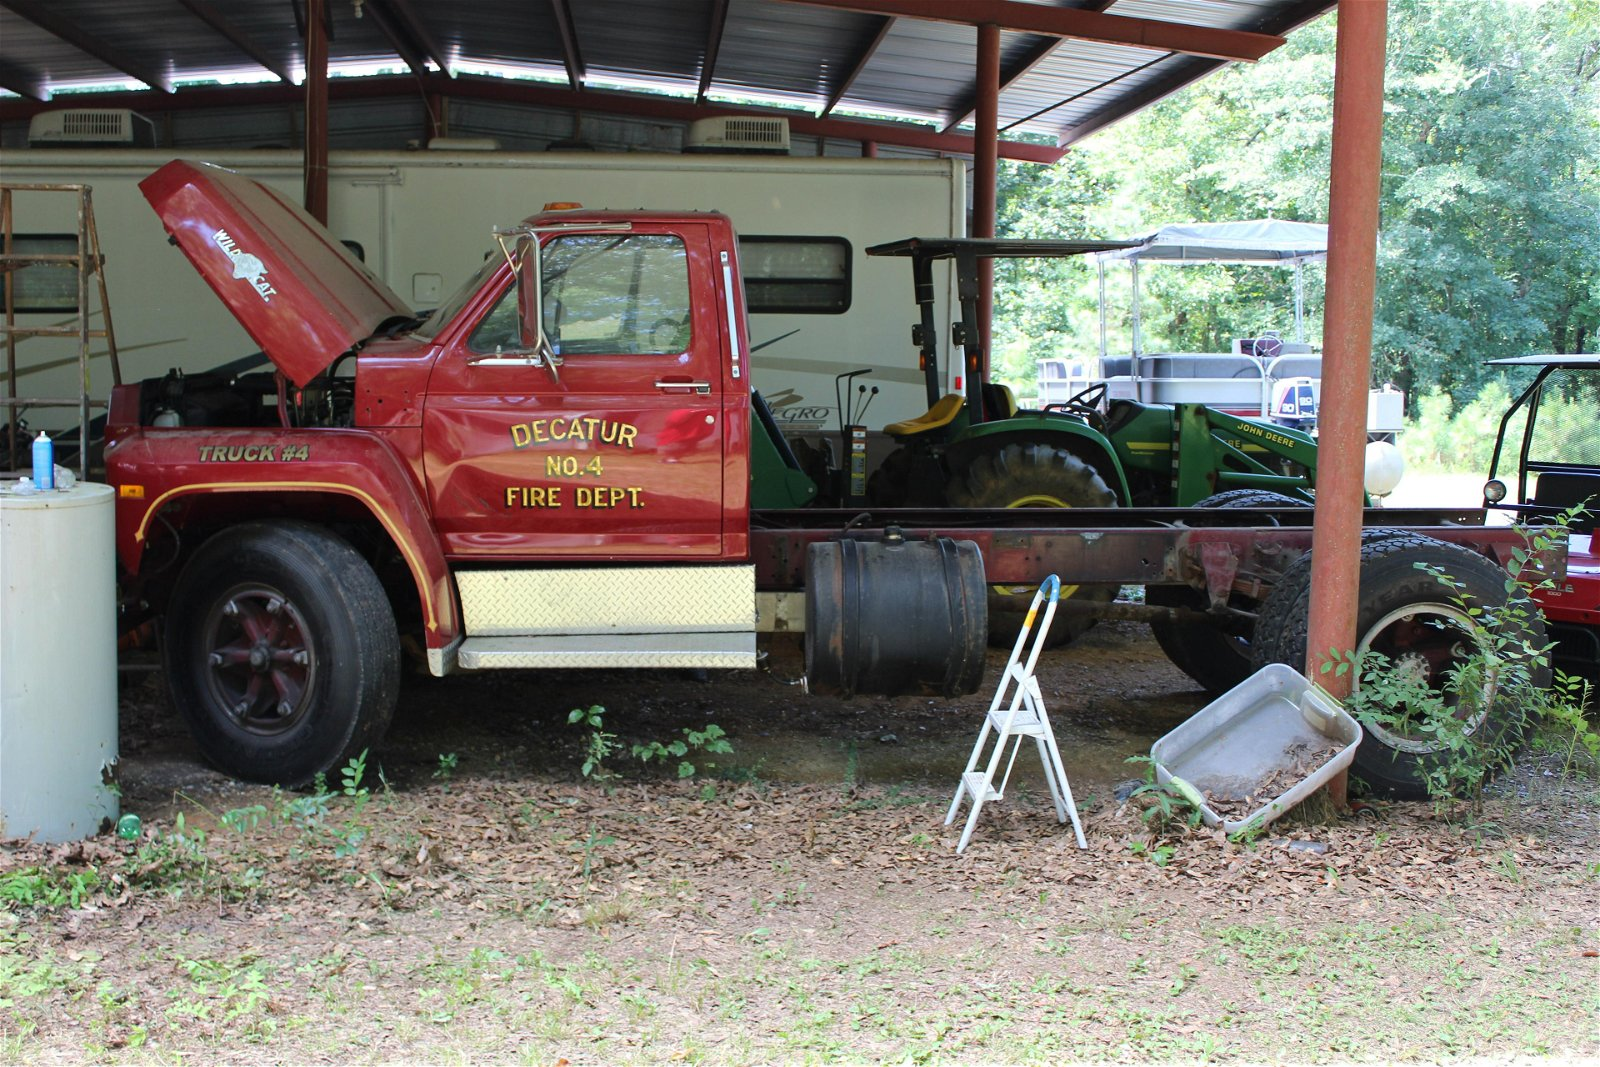 1984 Ford F820 fire truck